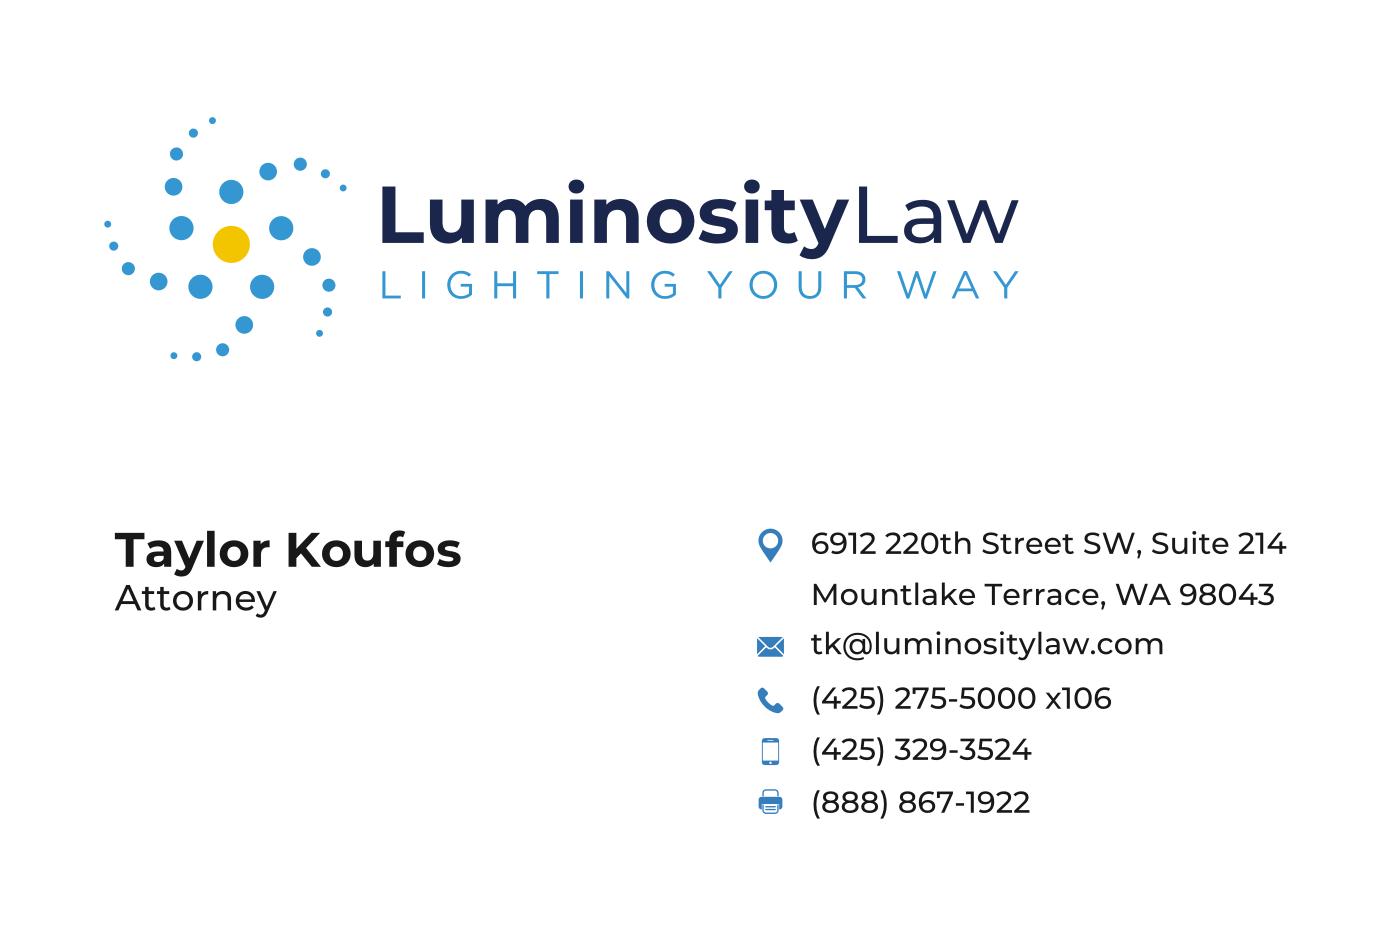 Luminosity Law